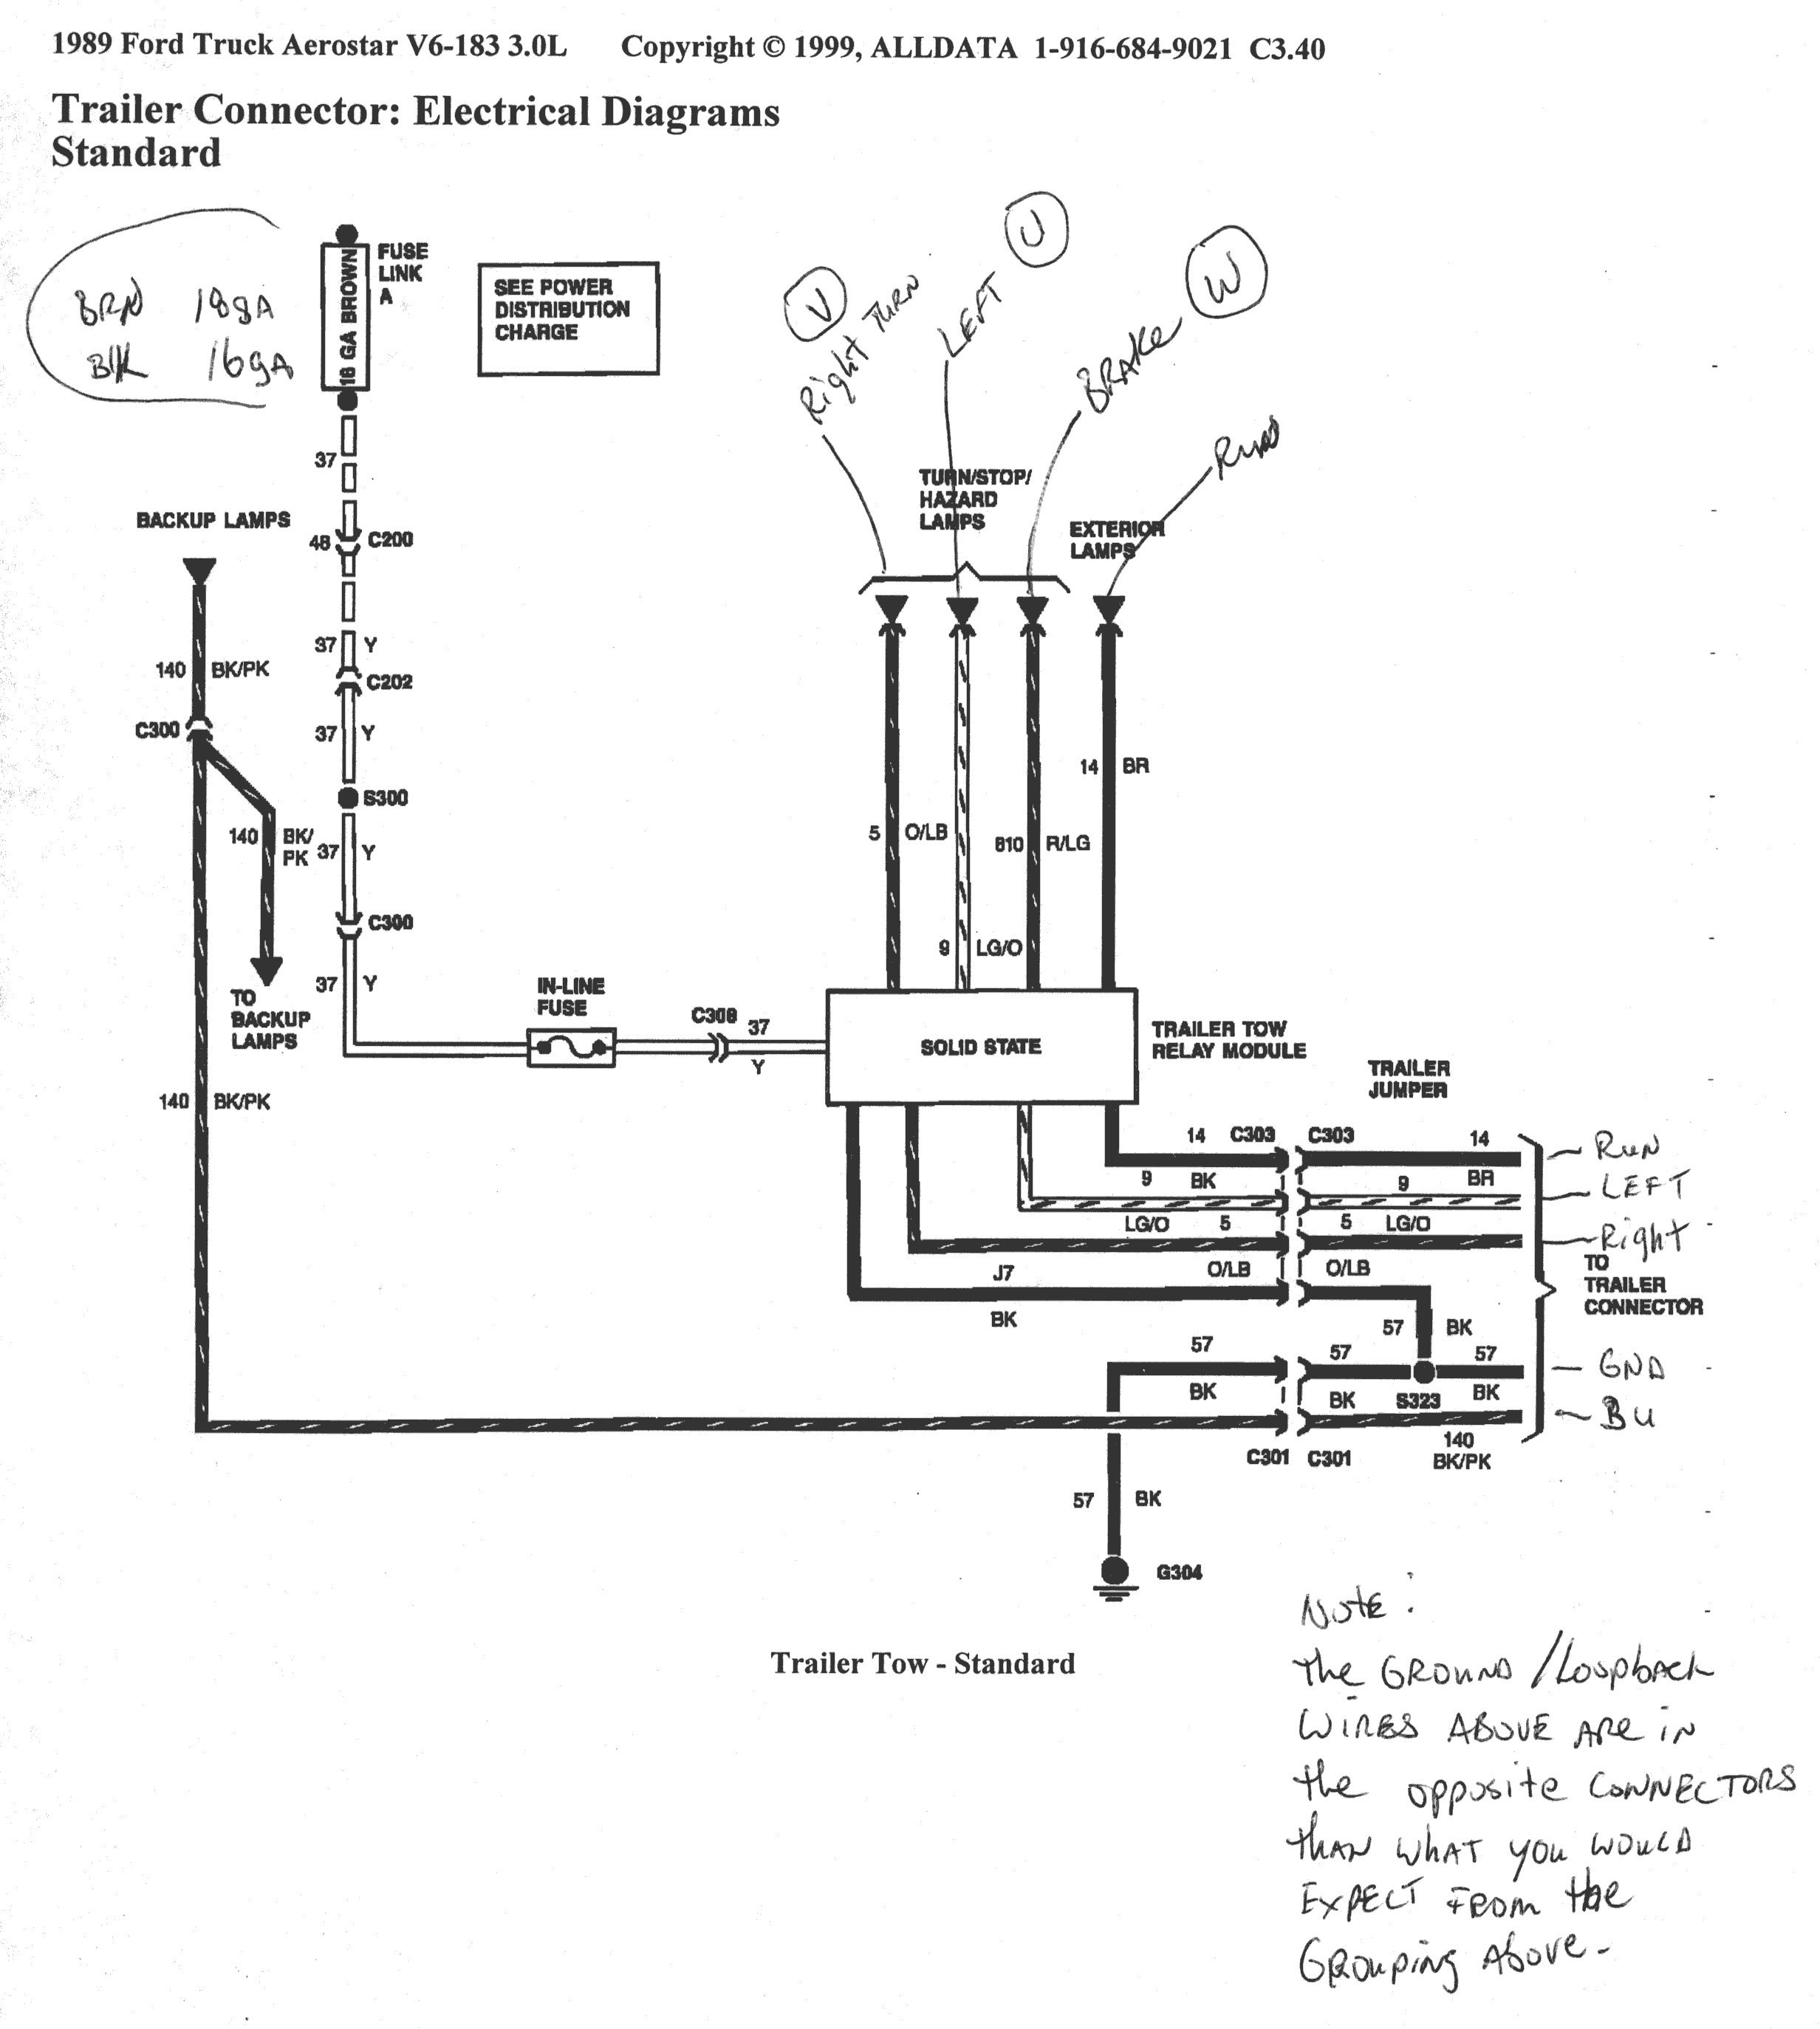 1997 Ford F800 Wiring Diagram Wiring Diagrams Comparison Metal A Comparison Metal A Alcuoredeldiabete It